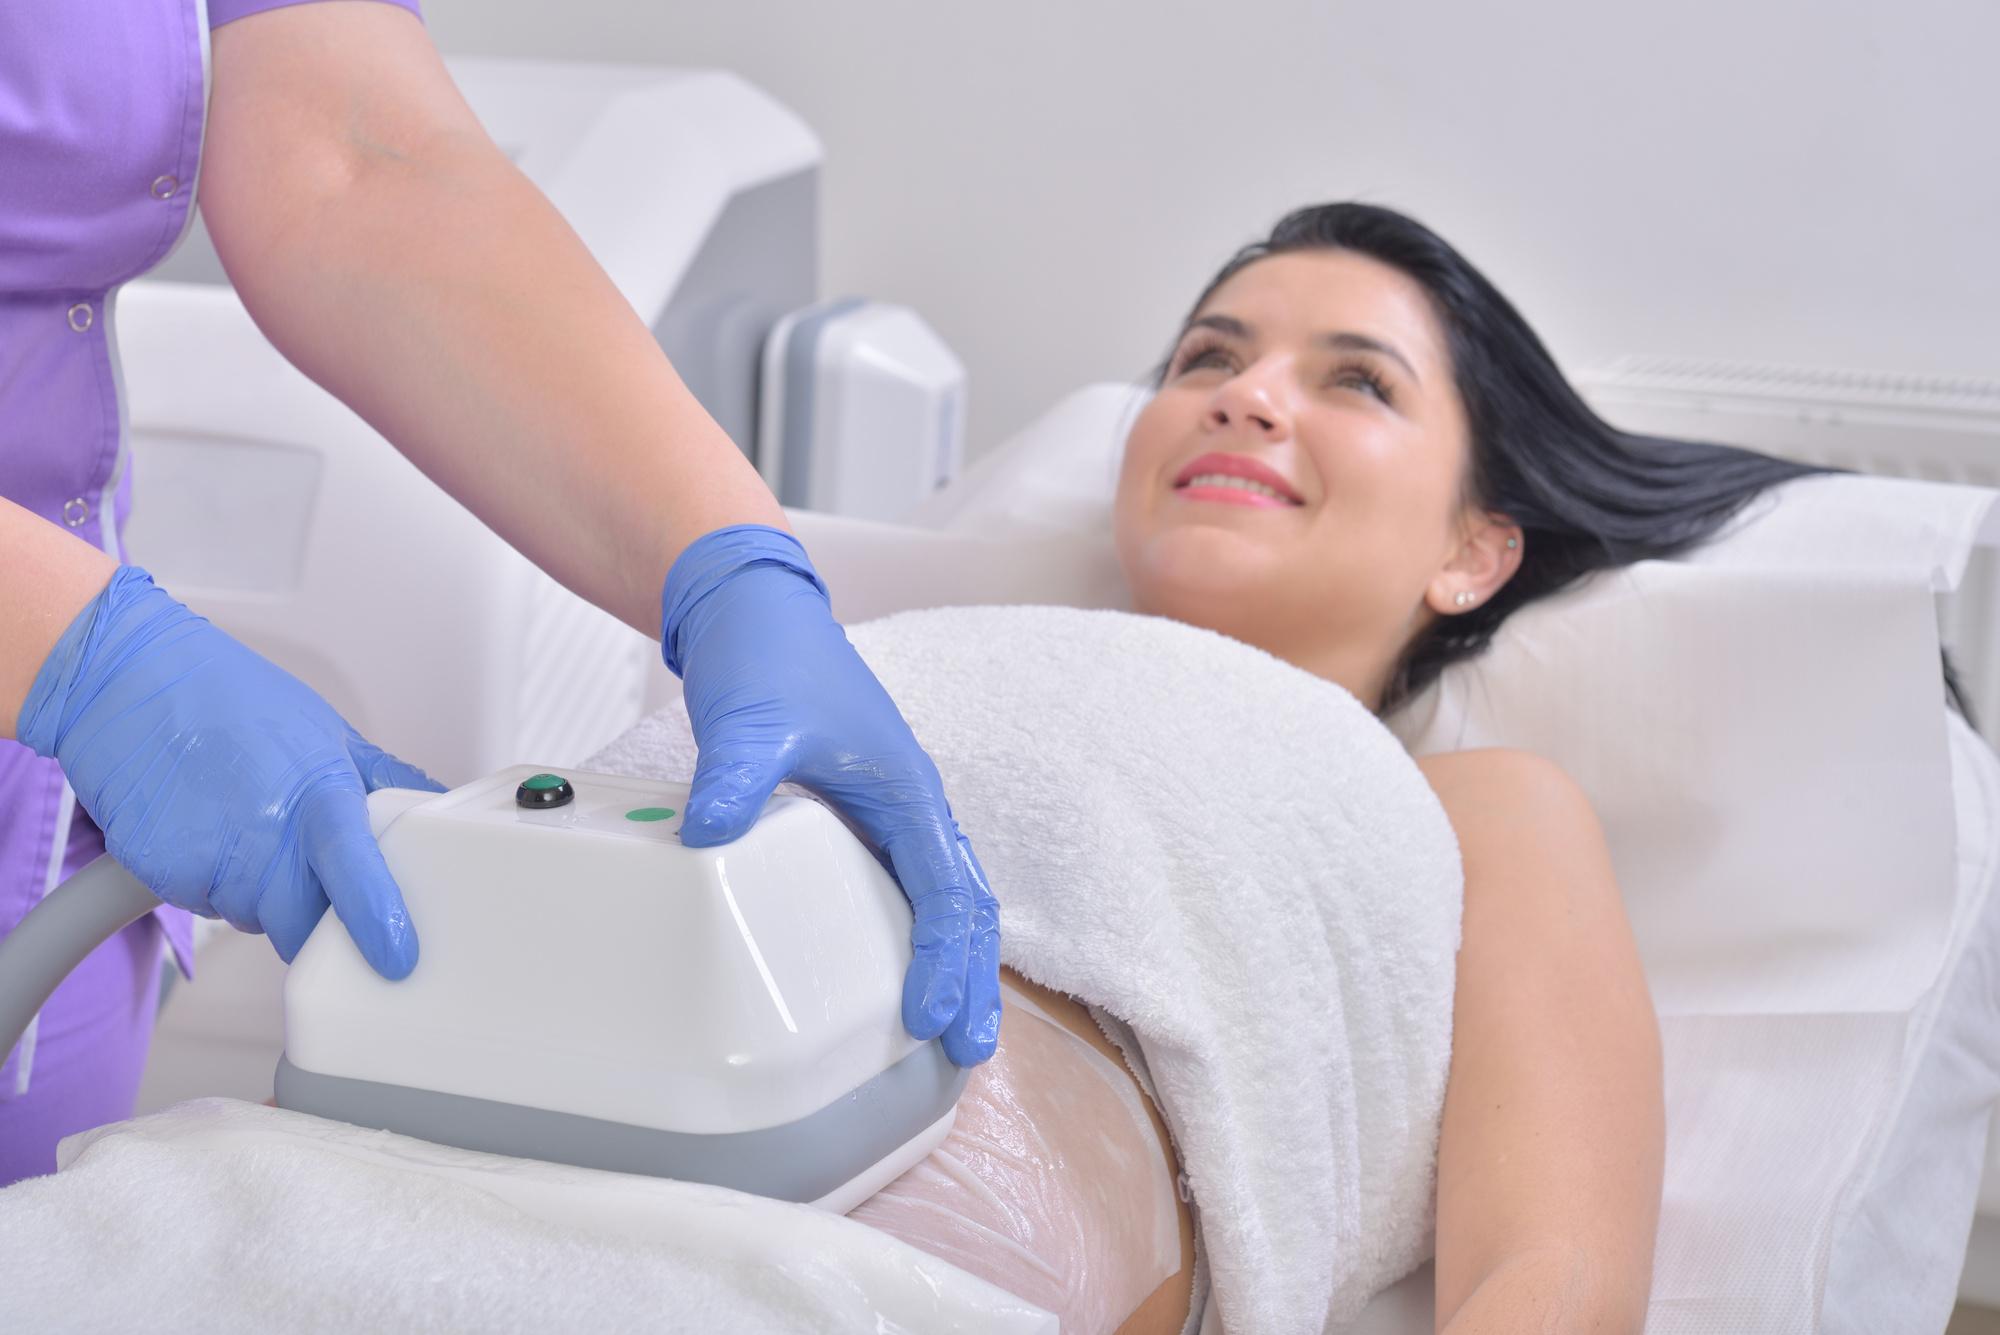 What is Vaser Liposuction?